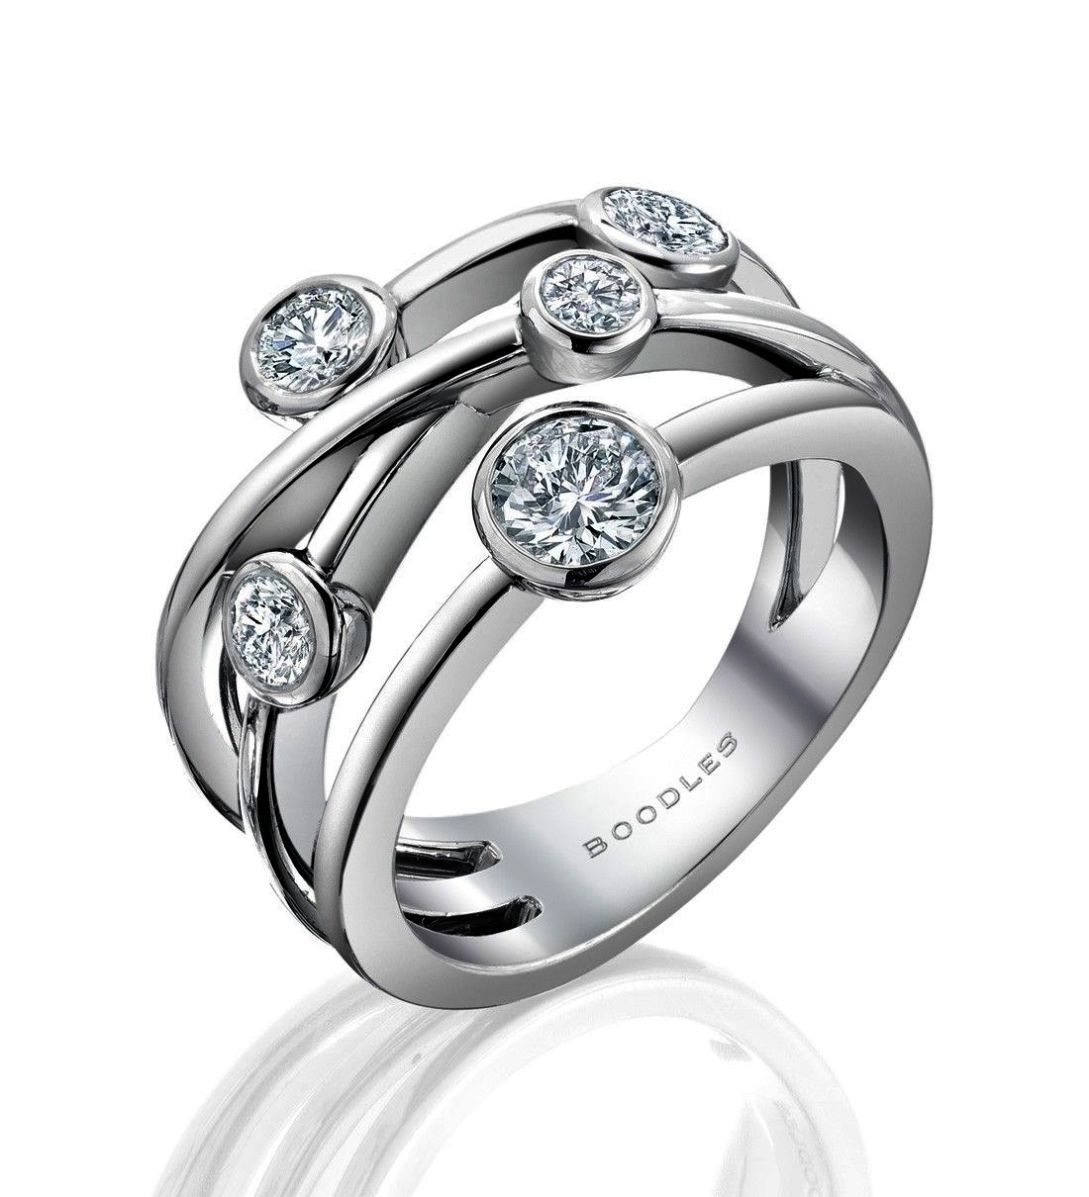 Oval diamond ring meaning rose gold wedding rings amazon diamond